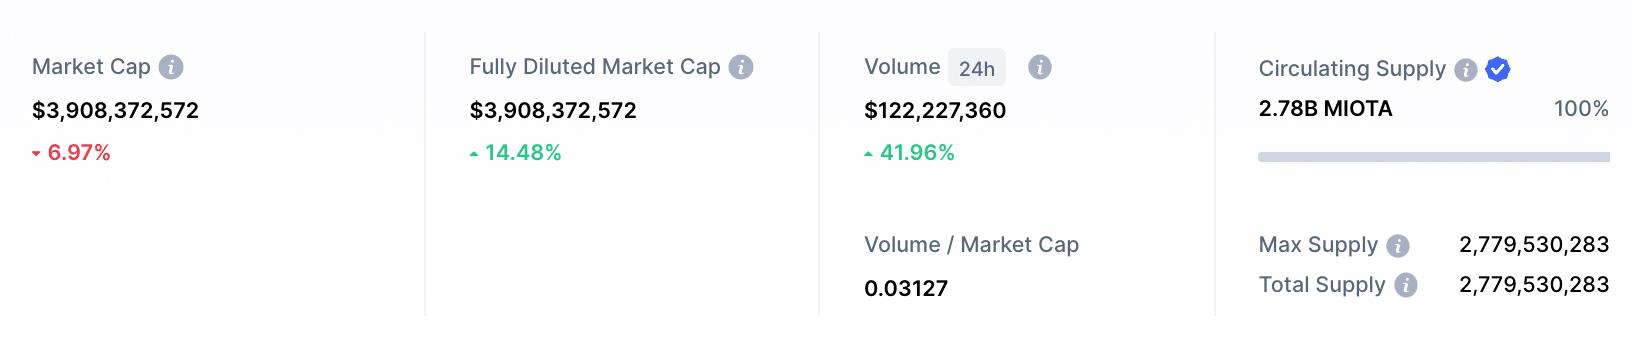 iota market cap